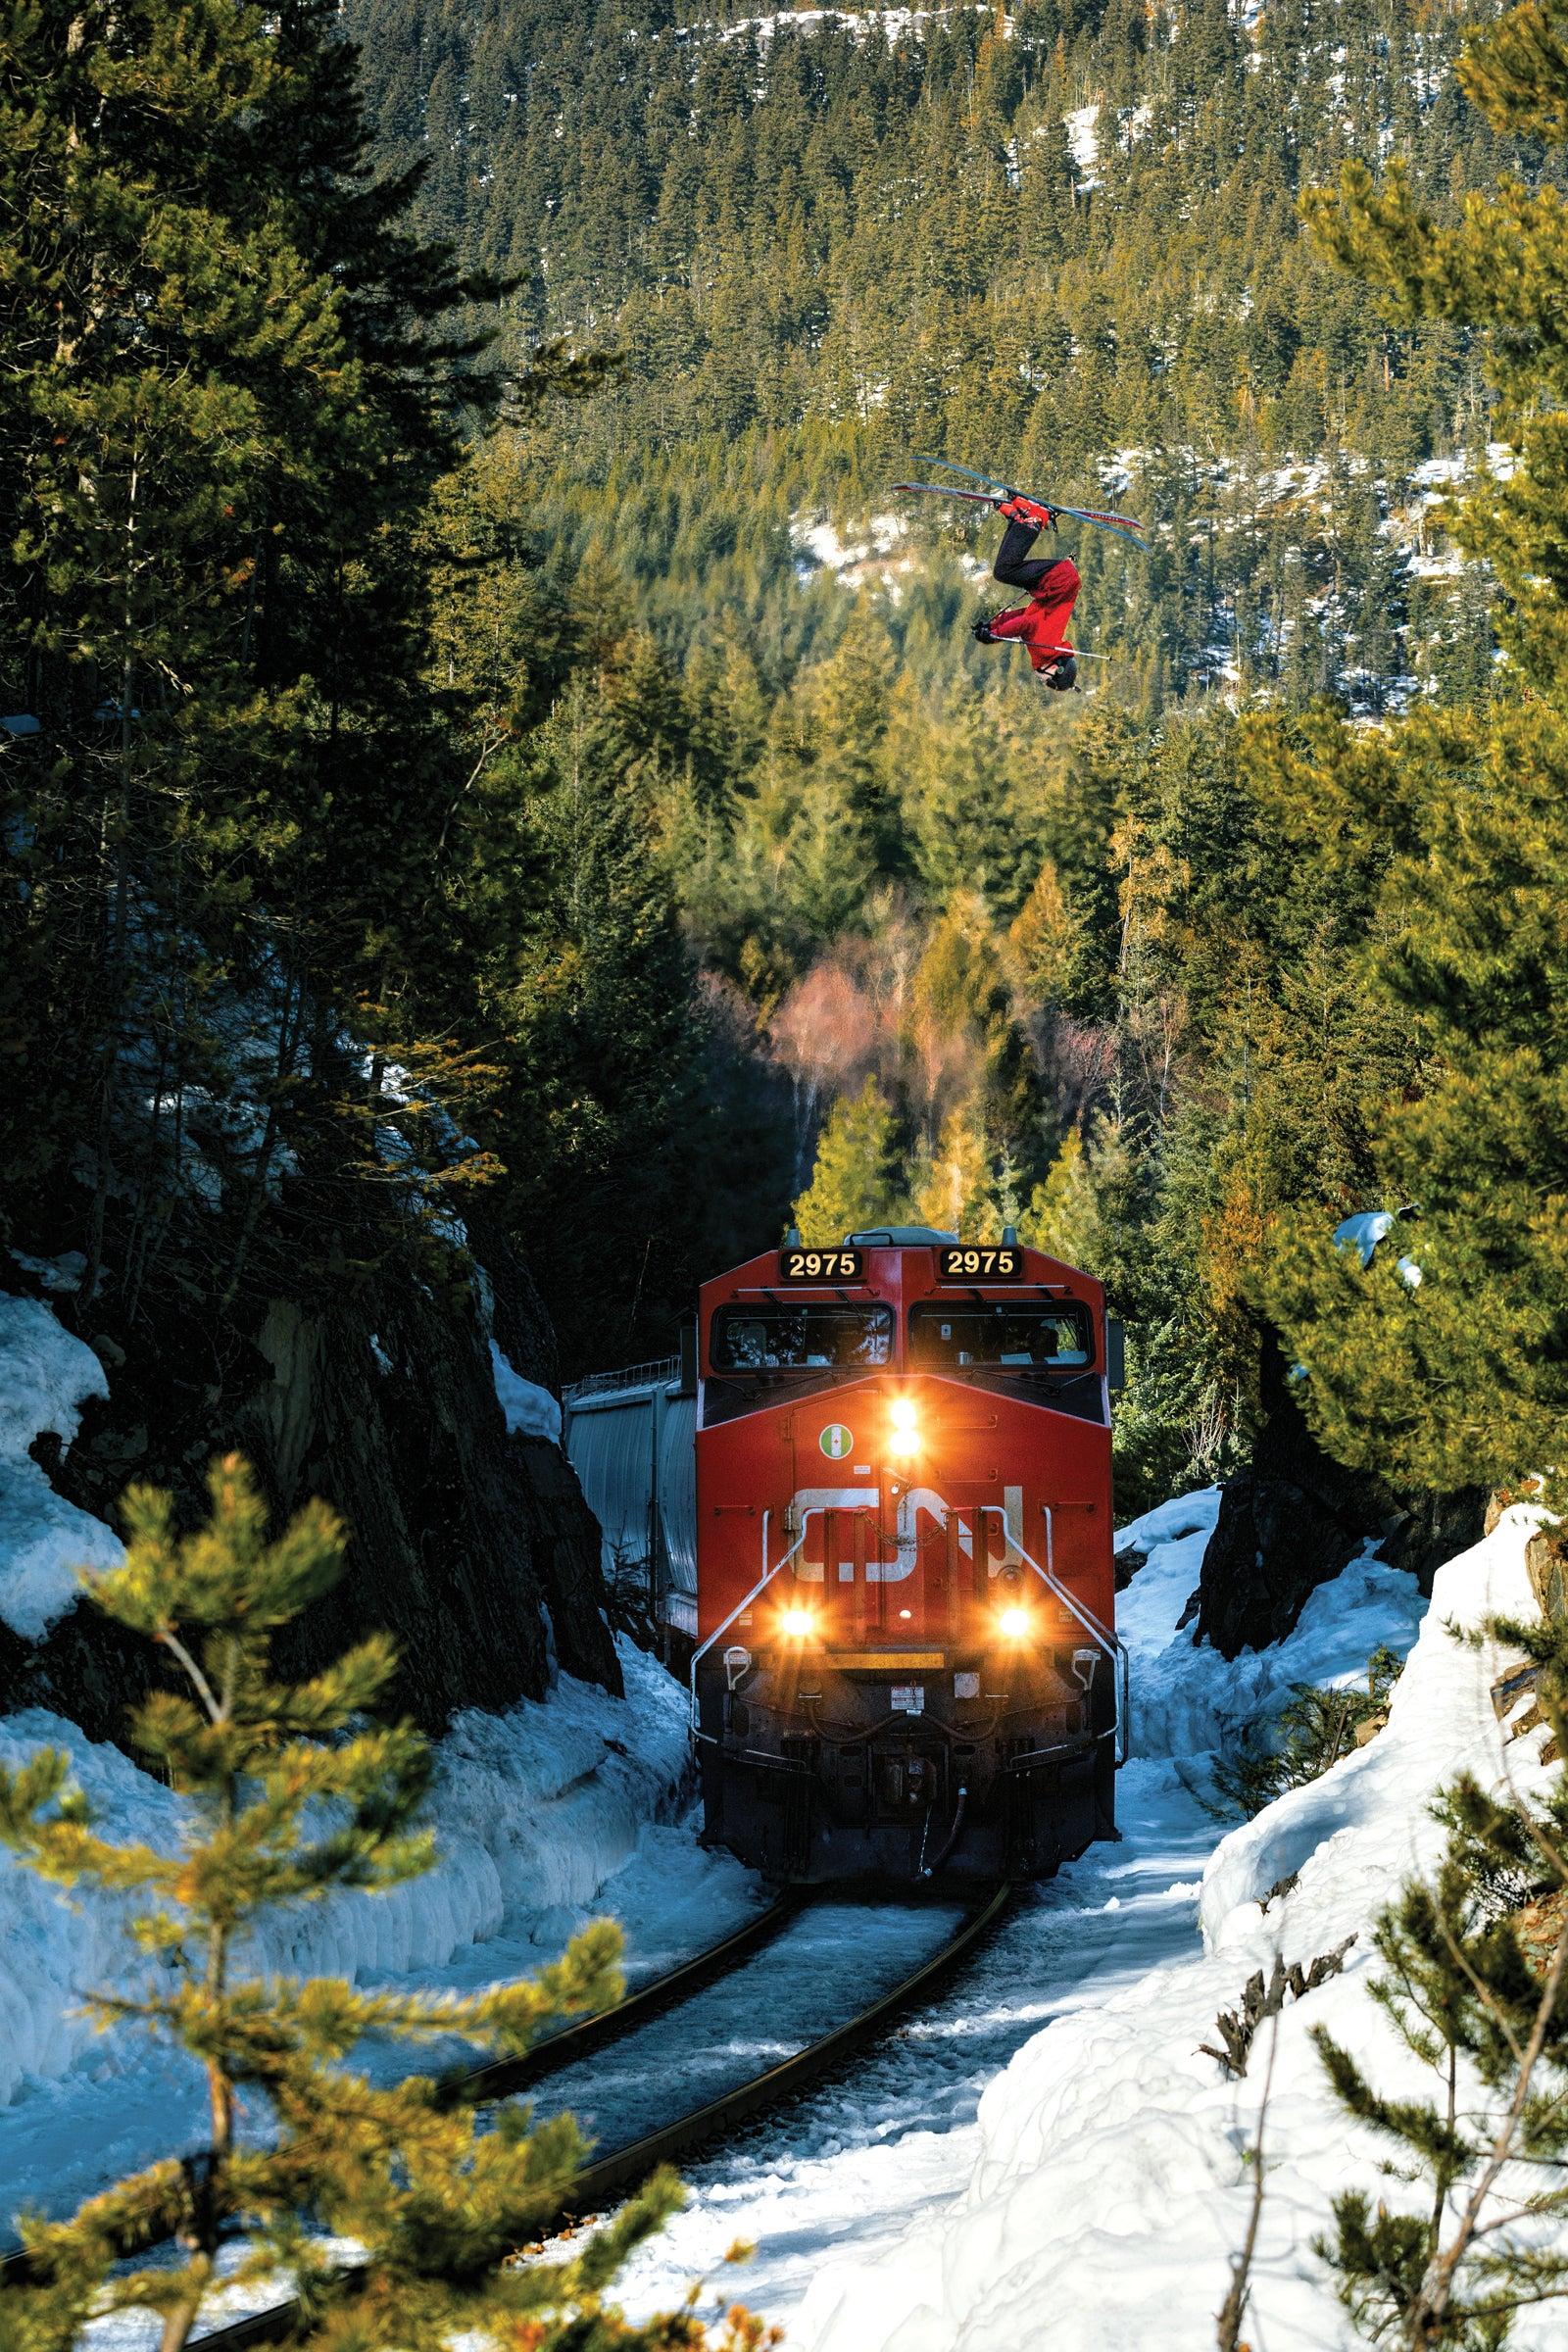 Eli Bucher backflips over a passing train